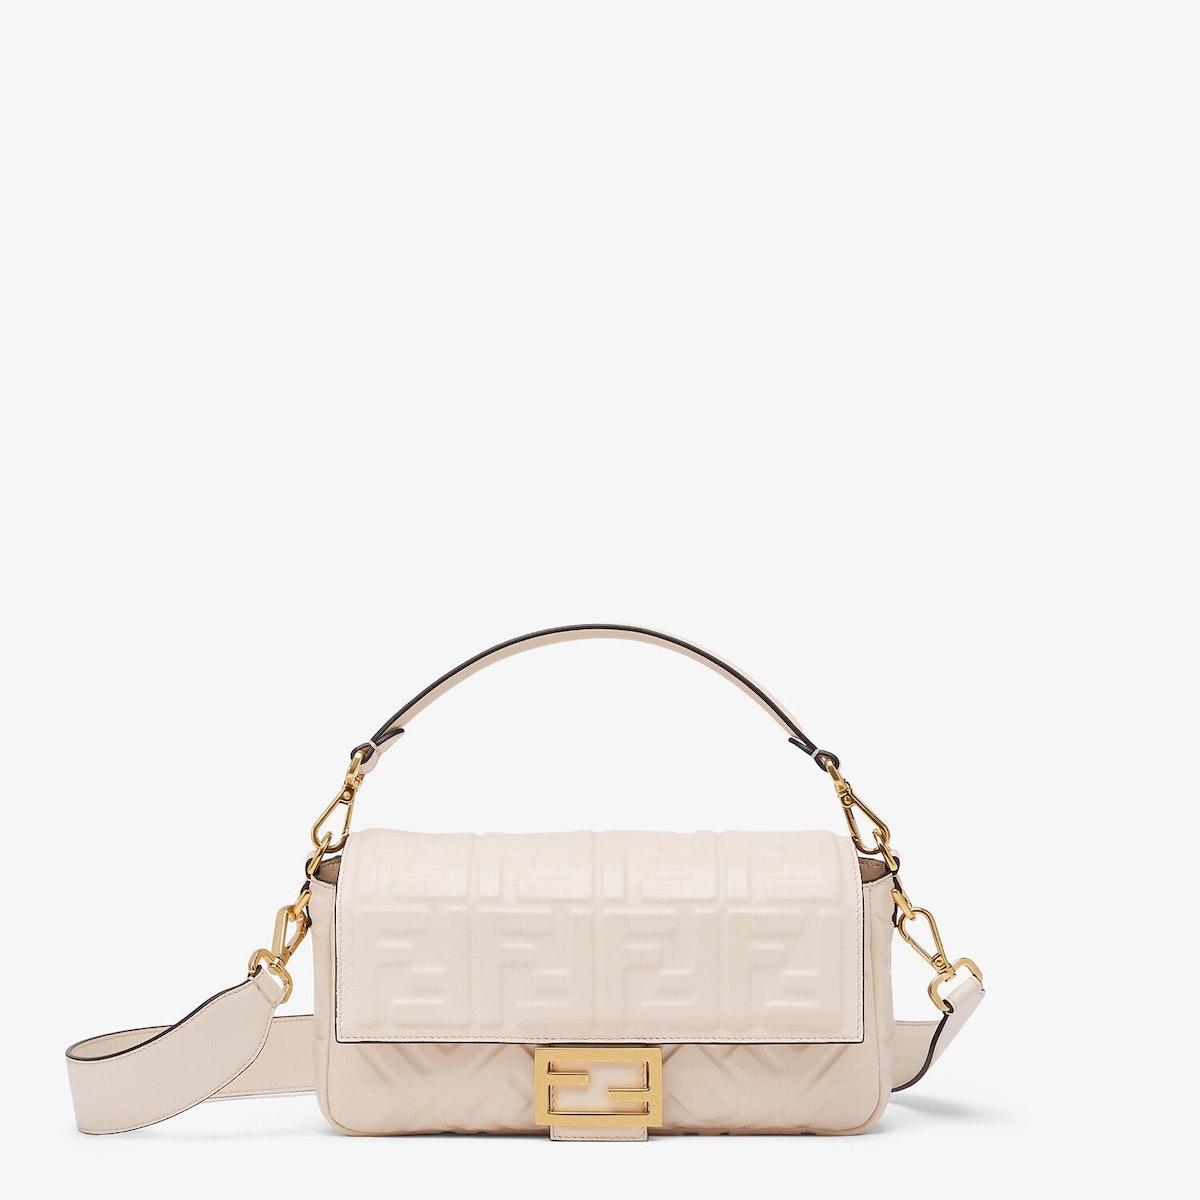 Baguette Camellia Nappa Leather Bag